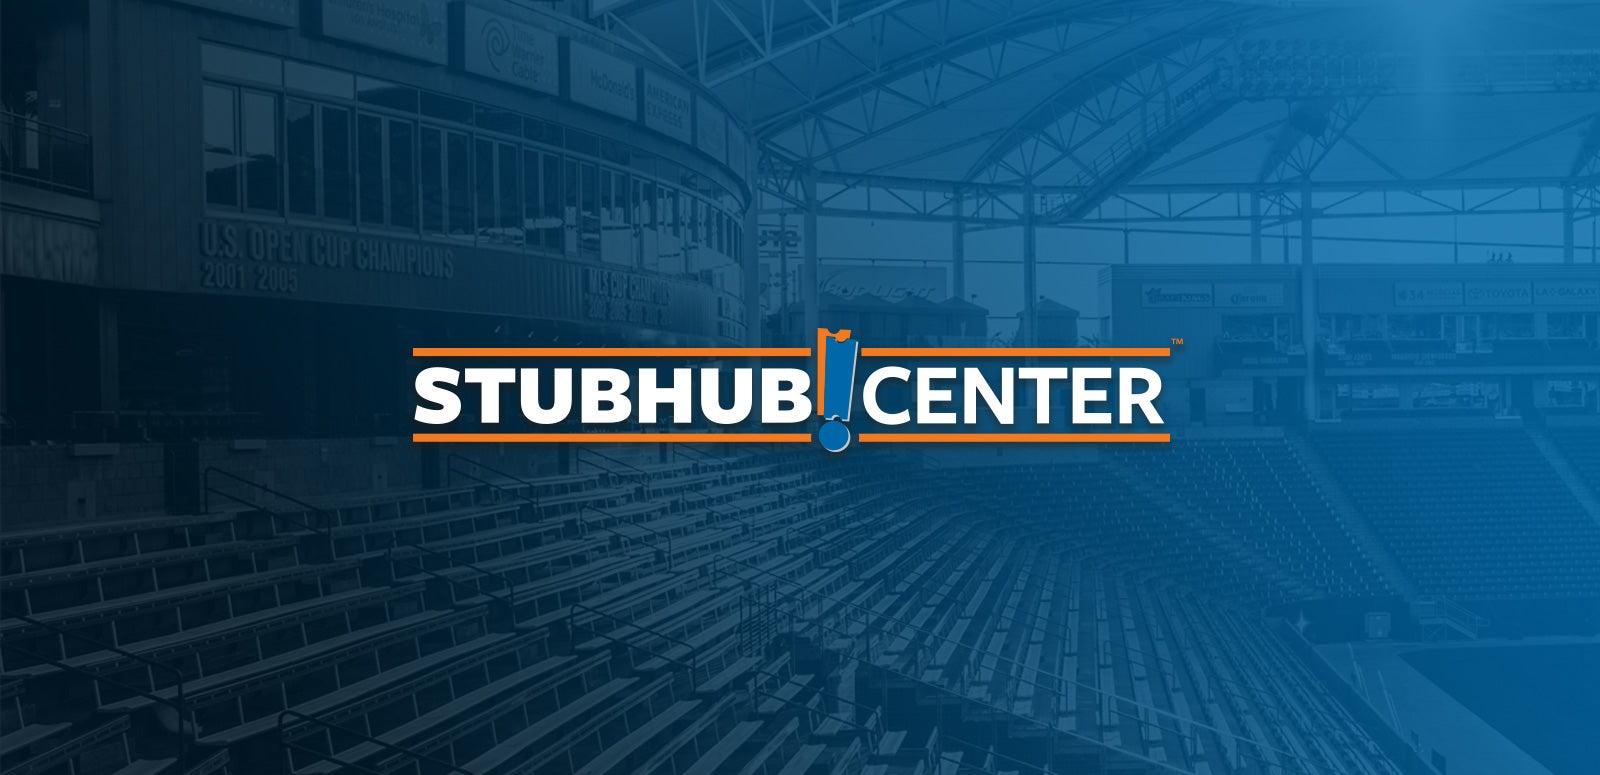 Events Stubhub Center